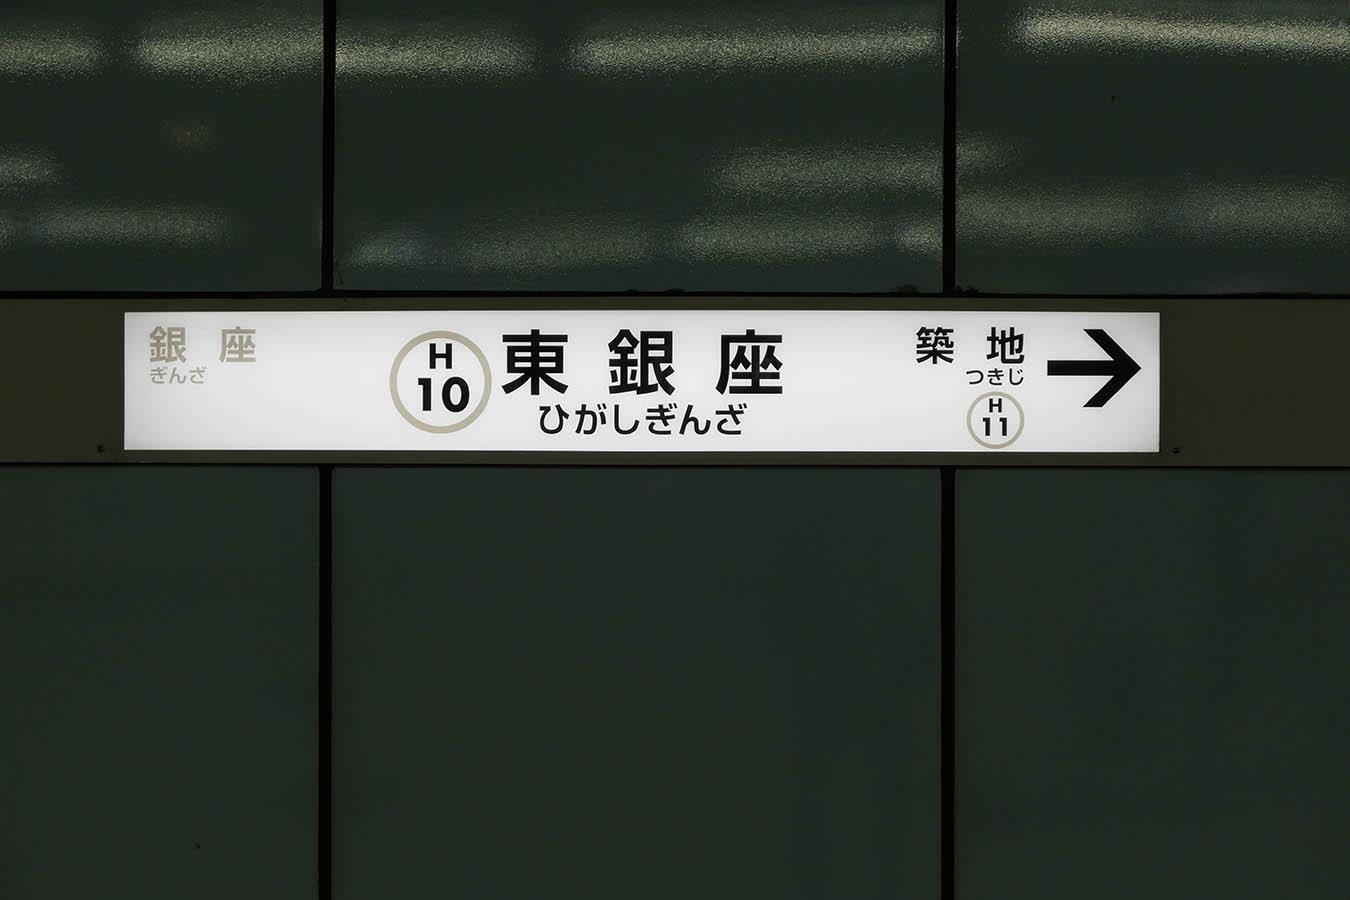 H10_photo05.jpg